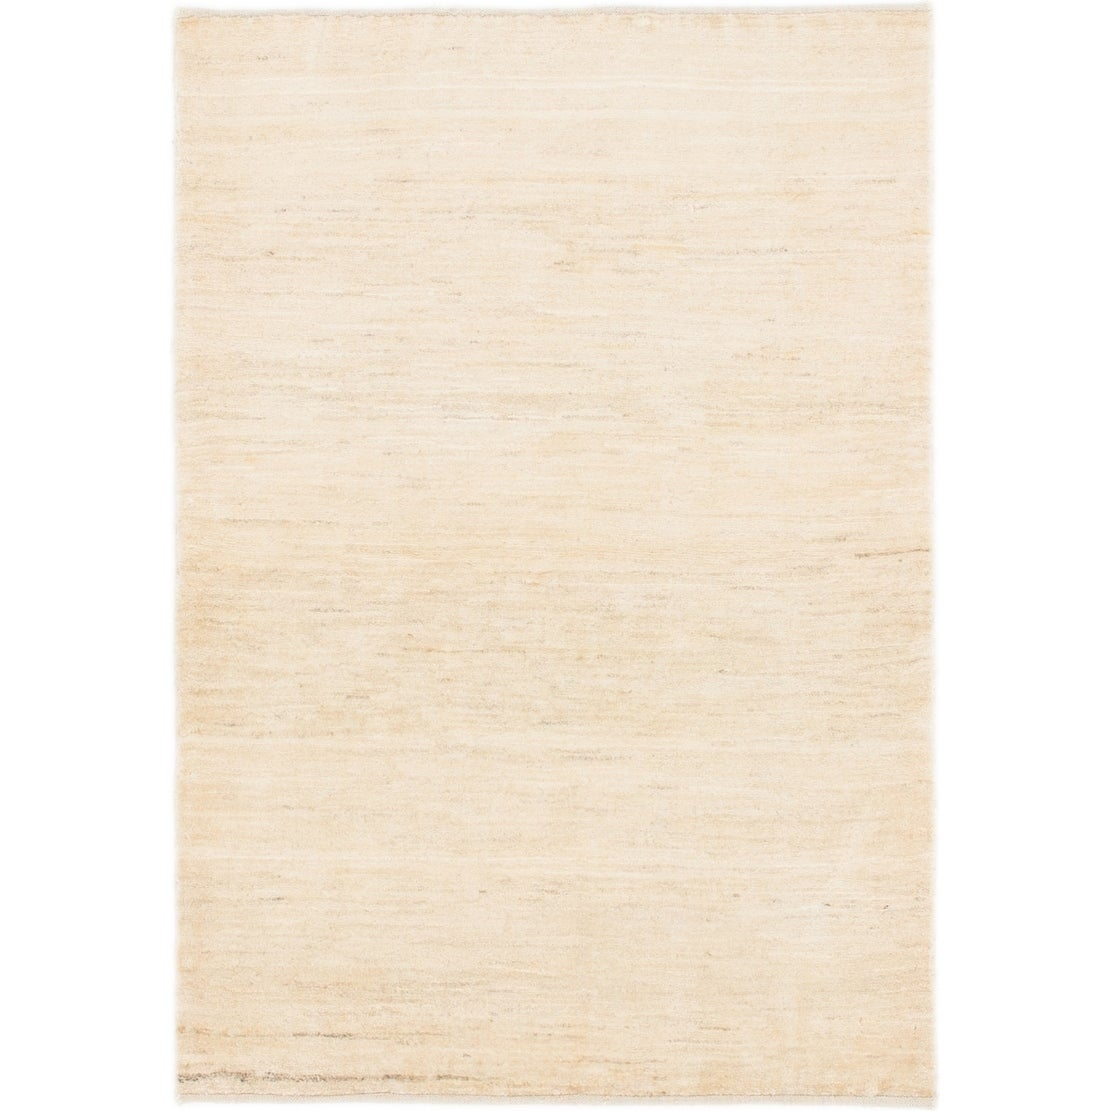 Hand Knotted Kashkuli Gabbeh Wool Area Rug - 3 3 x 4 9 (Cream - 3 3 x 4 9)